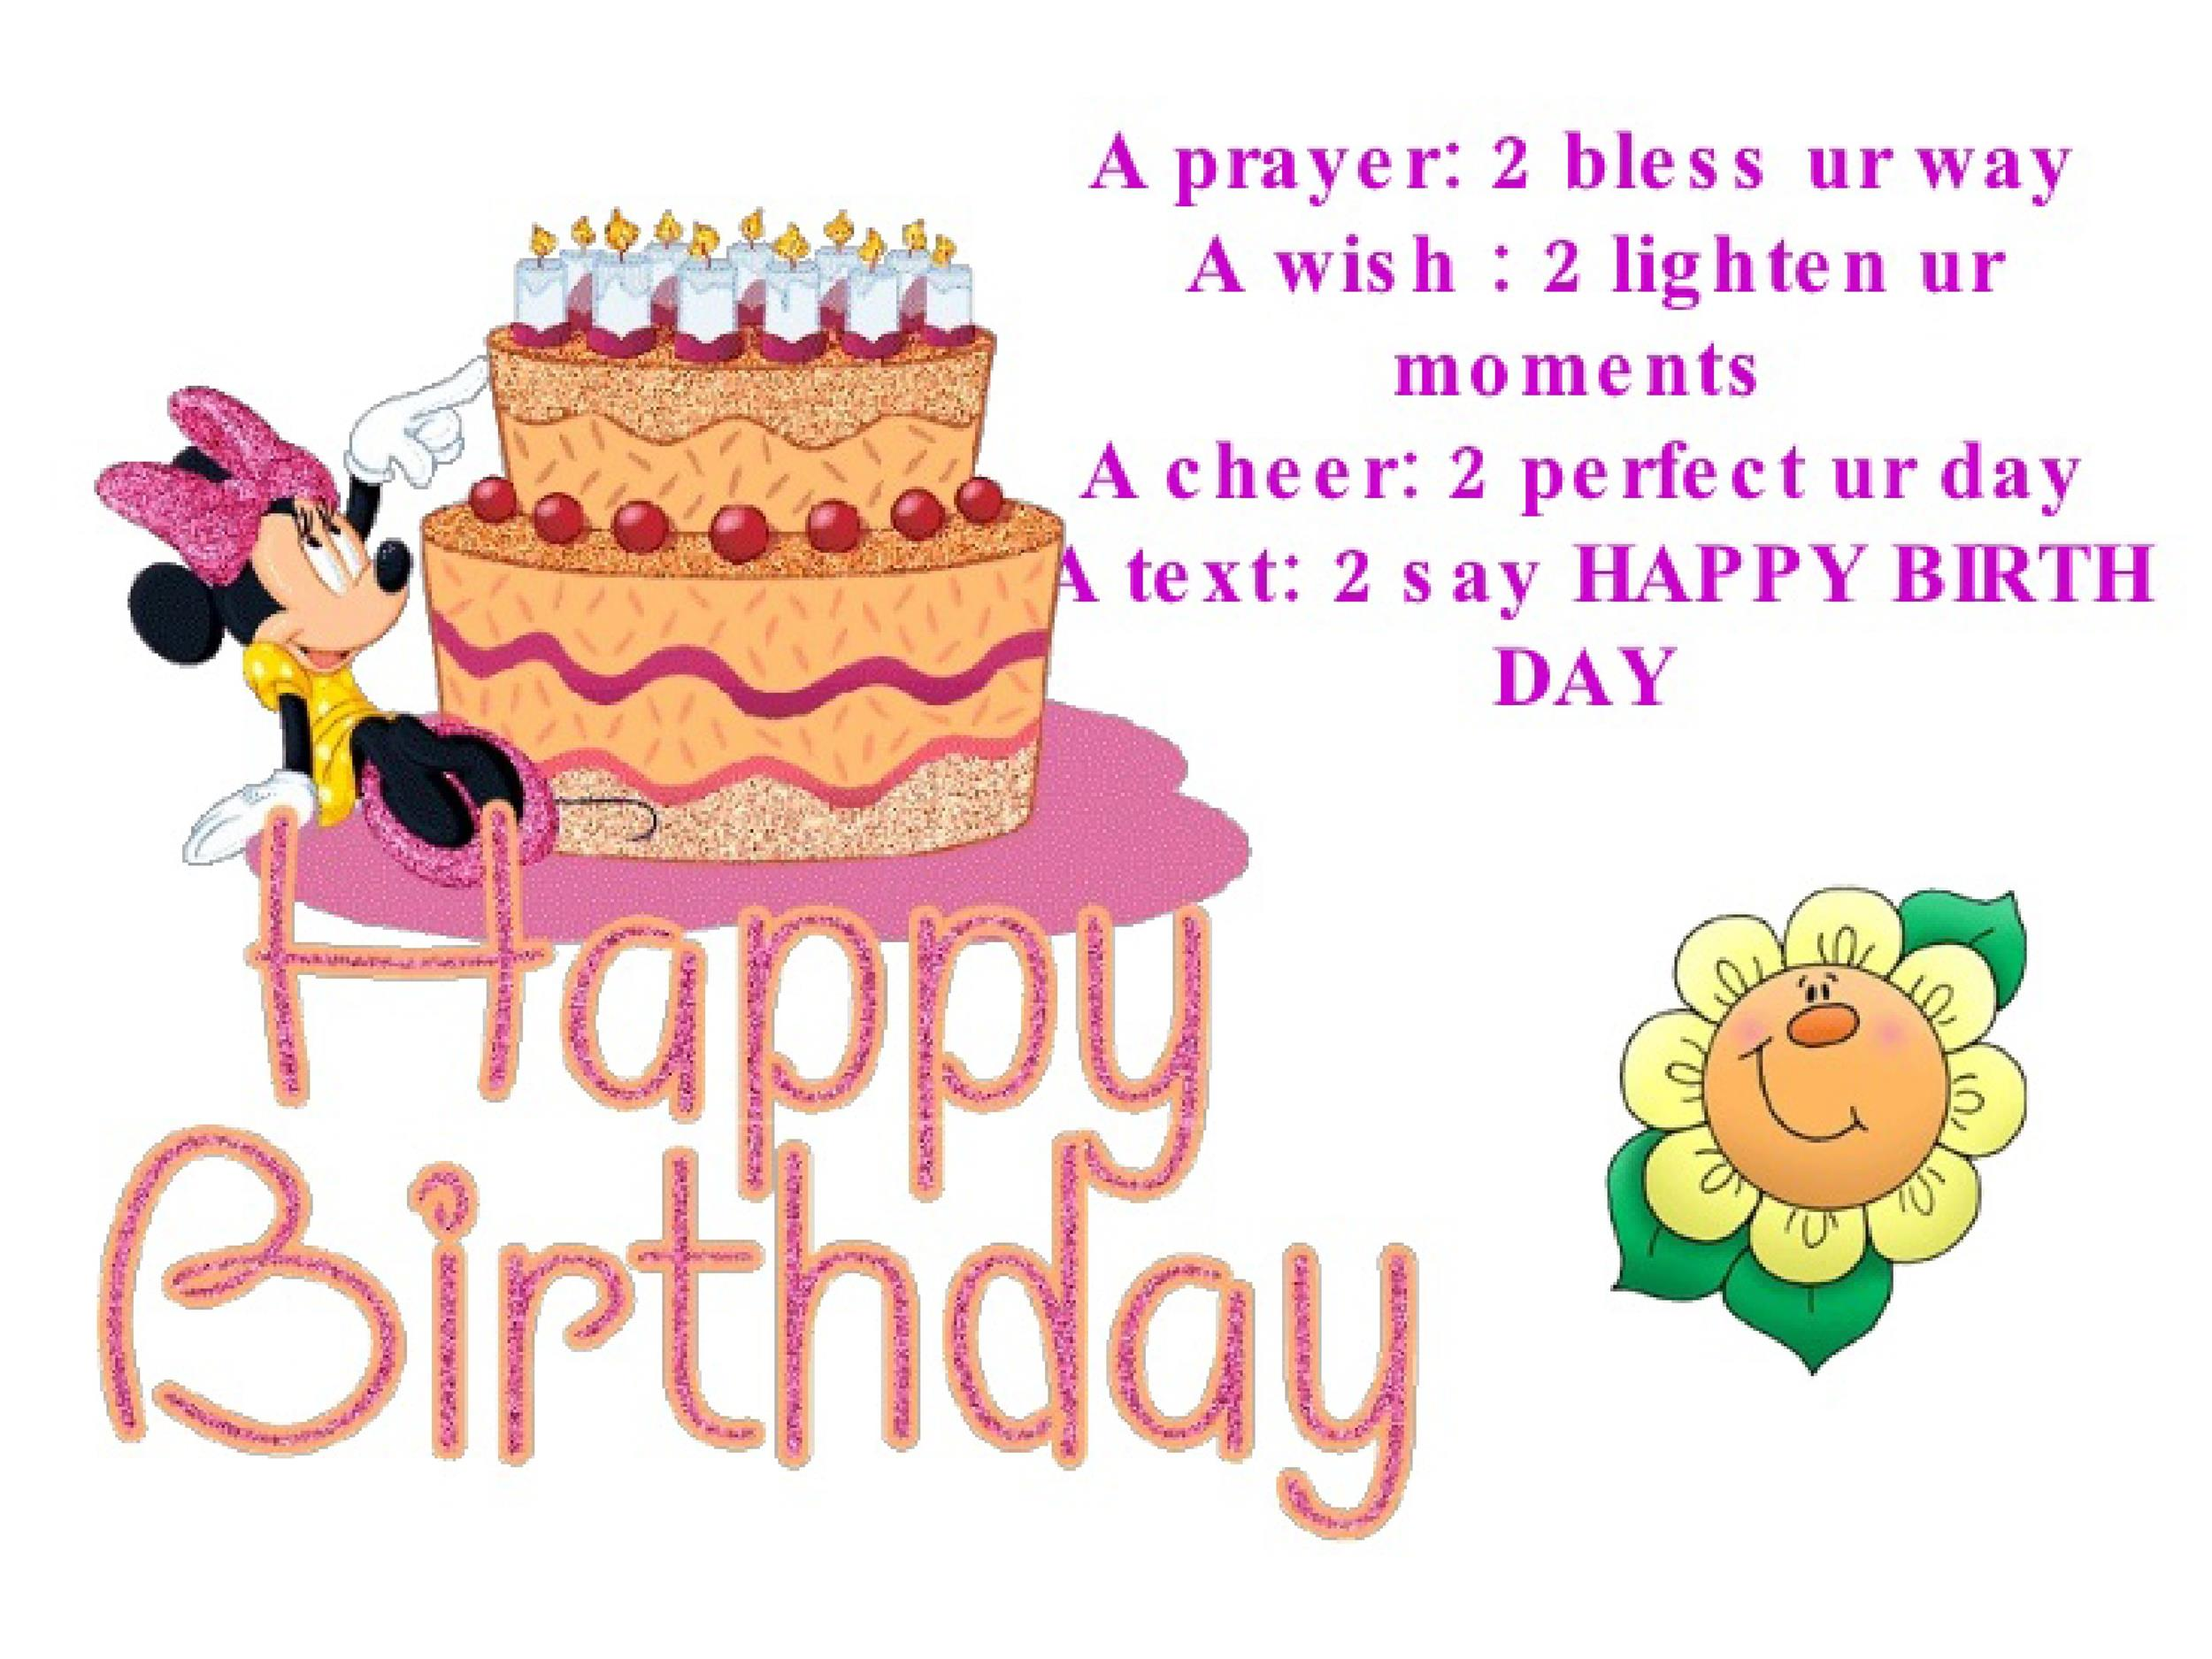 40+ FREE Birthday Card Templates - Template Lab - happy birthday cards templates